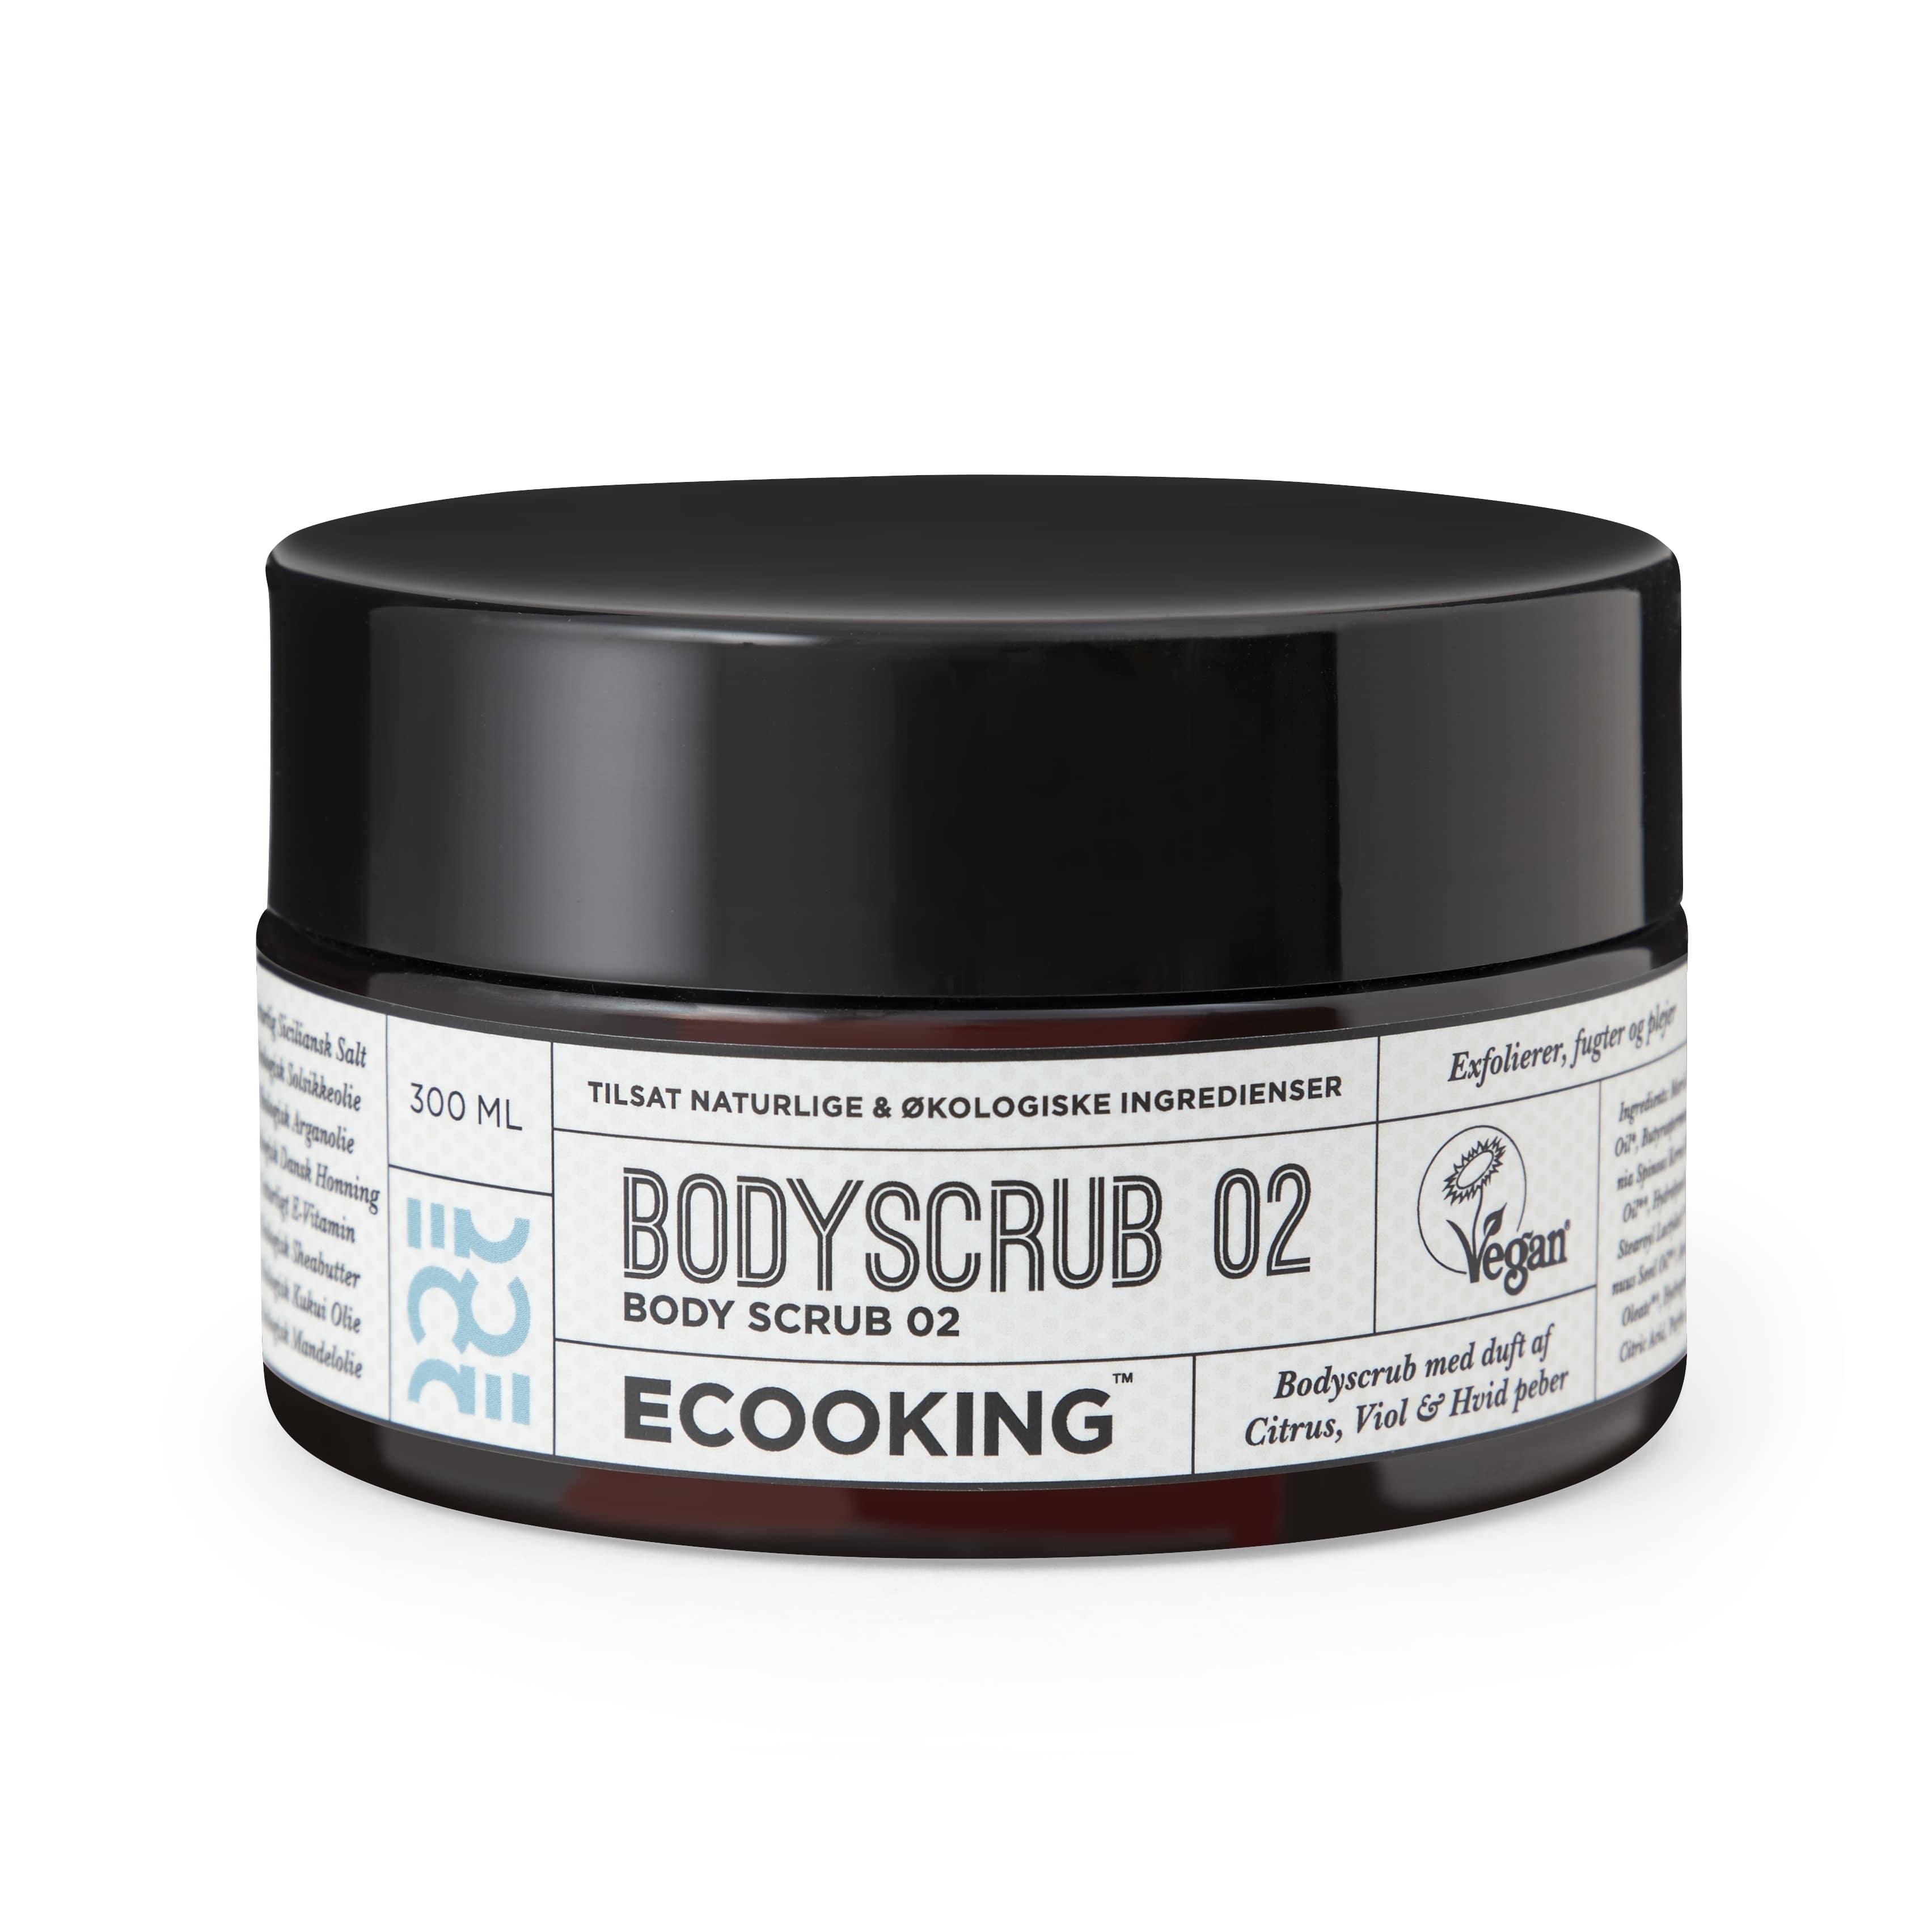 Ecooking Body Scrub 02, 300 ml